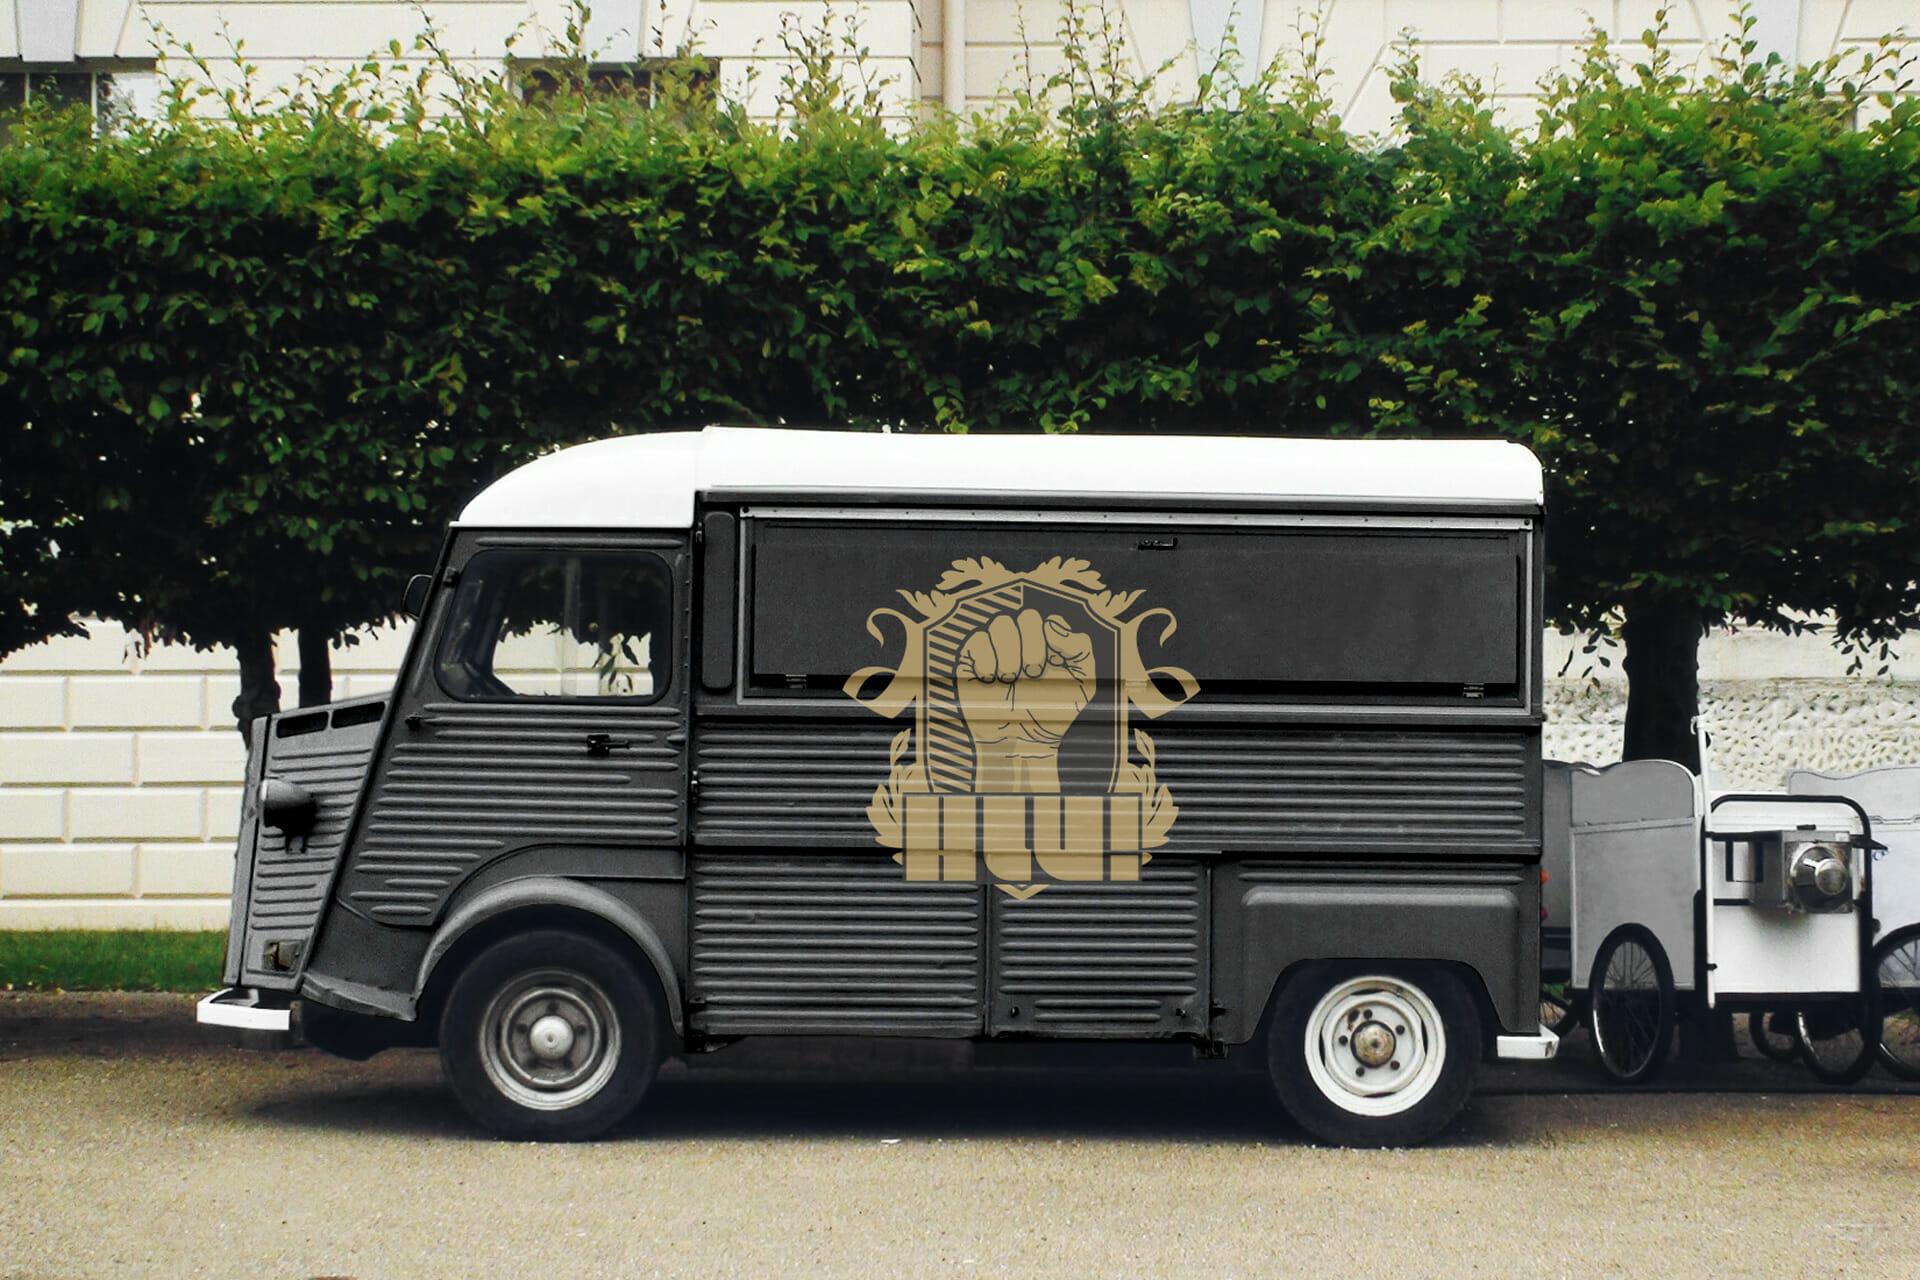 HLV-Food-Truck